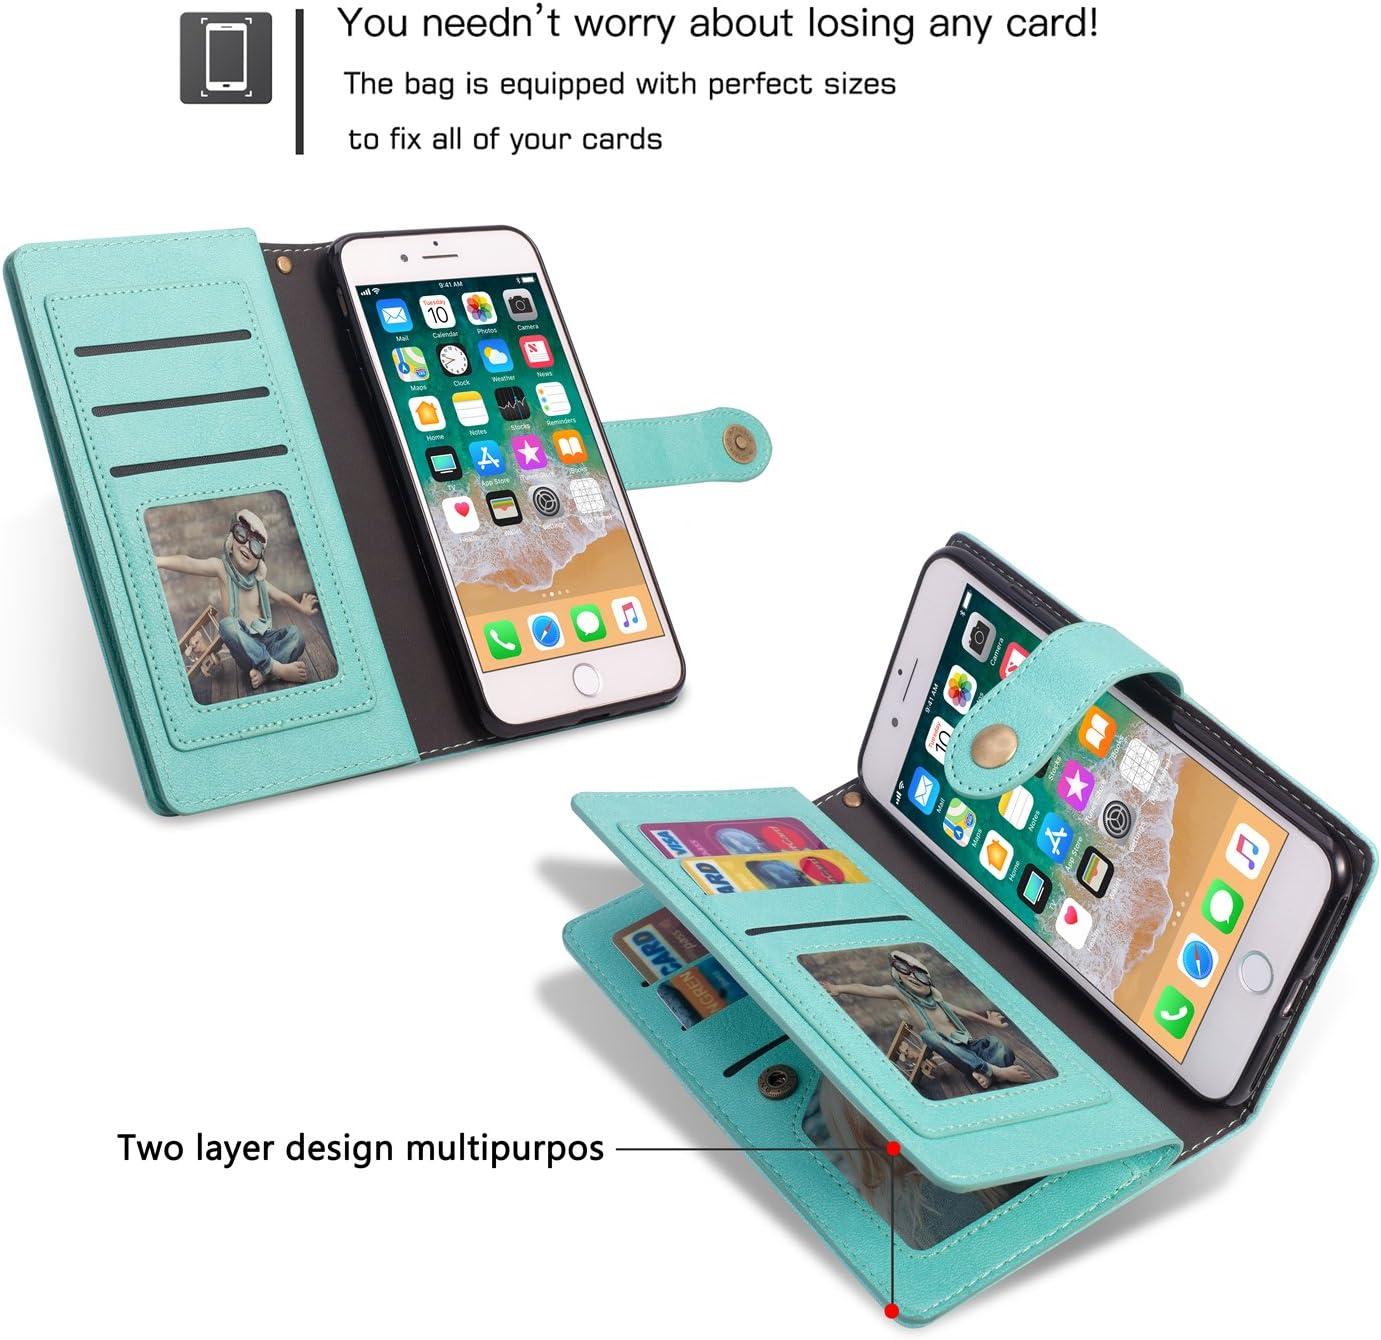 Wallet Case for Galaxy J7 2018 Case Women//Girls 9 Card Slots for Galaxy J7 2018 Blue Photo/&Wallet Pocket Retro Tech Soft Leather Multi-Function Handmade Flip Shockproof Snap-Fastener